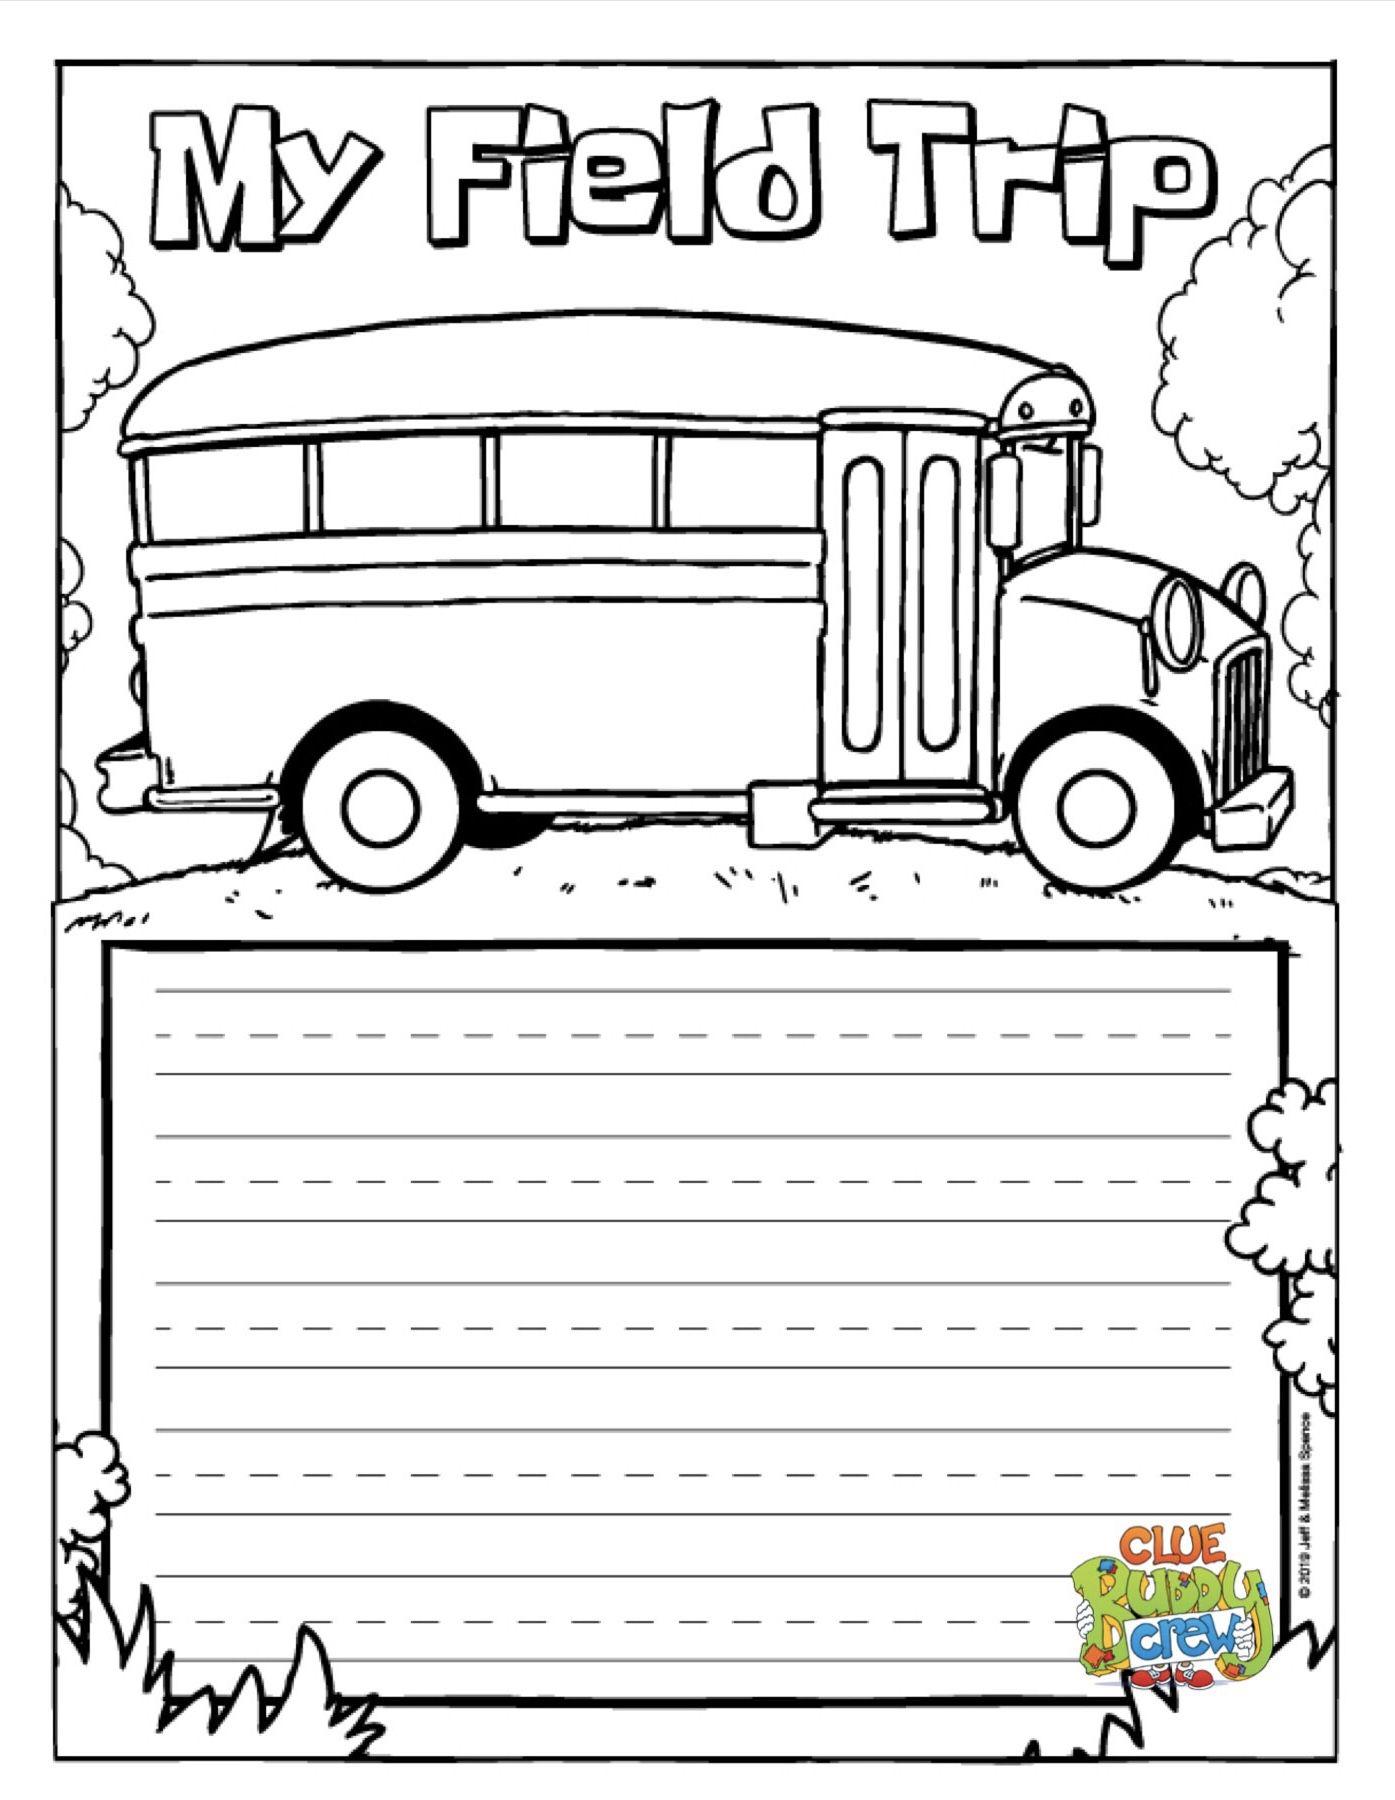 My Field Trip Reflection Writing Sheet